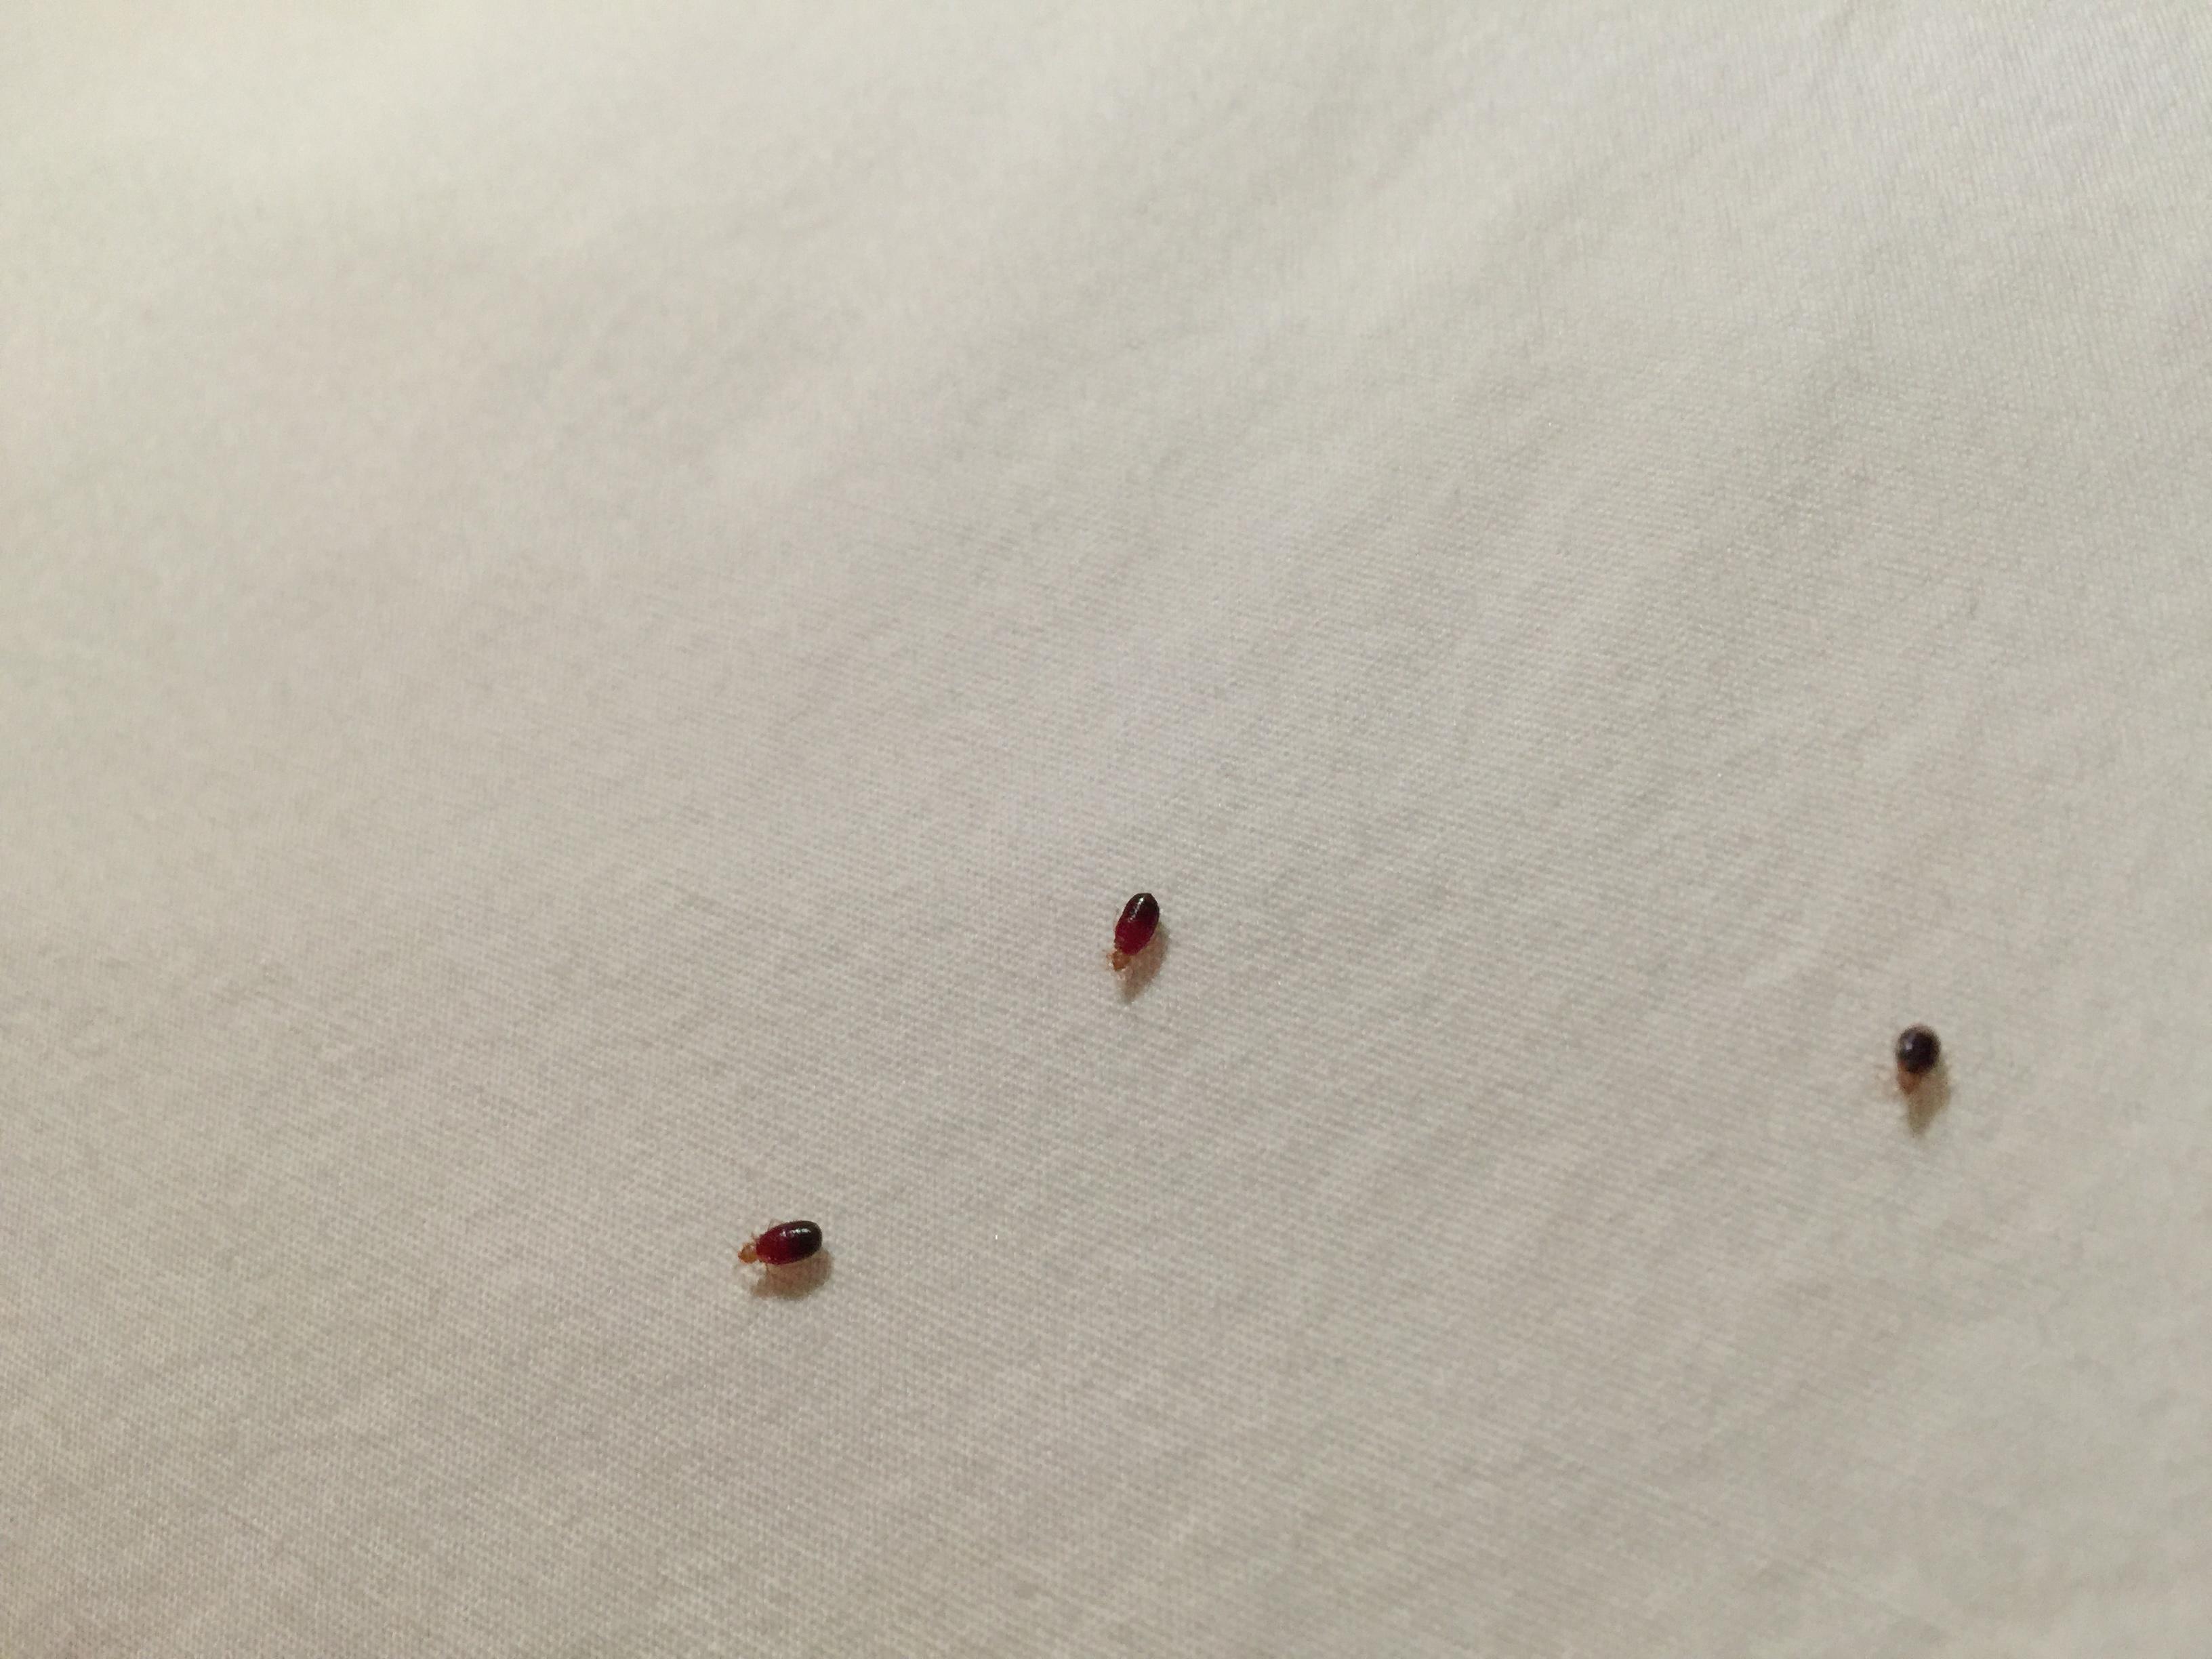 Rancho Cordova Ca Bed Bug Hotel And Apartment Reports